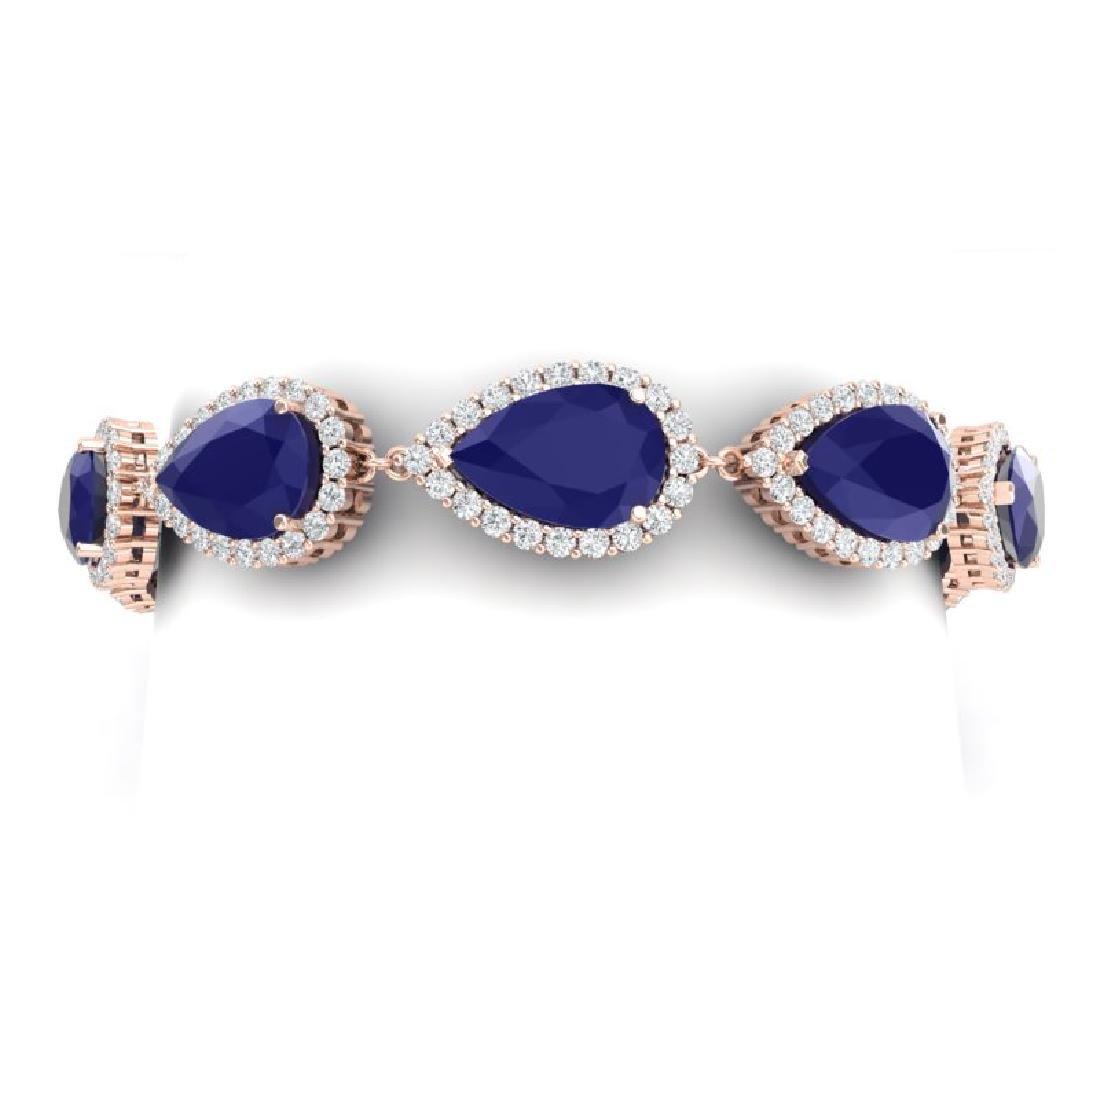 42 CTW Royalty Sapphire & VS Diamond Bracelet 18K Rose